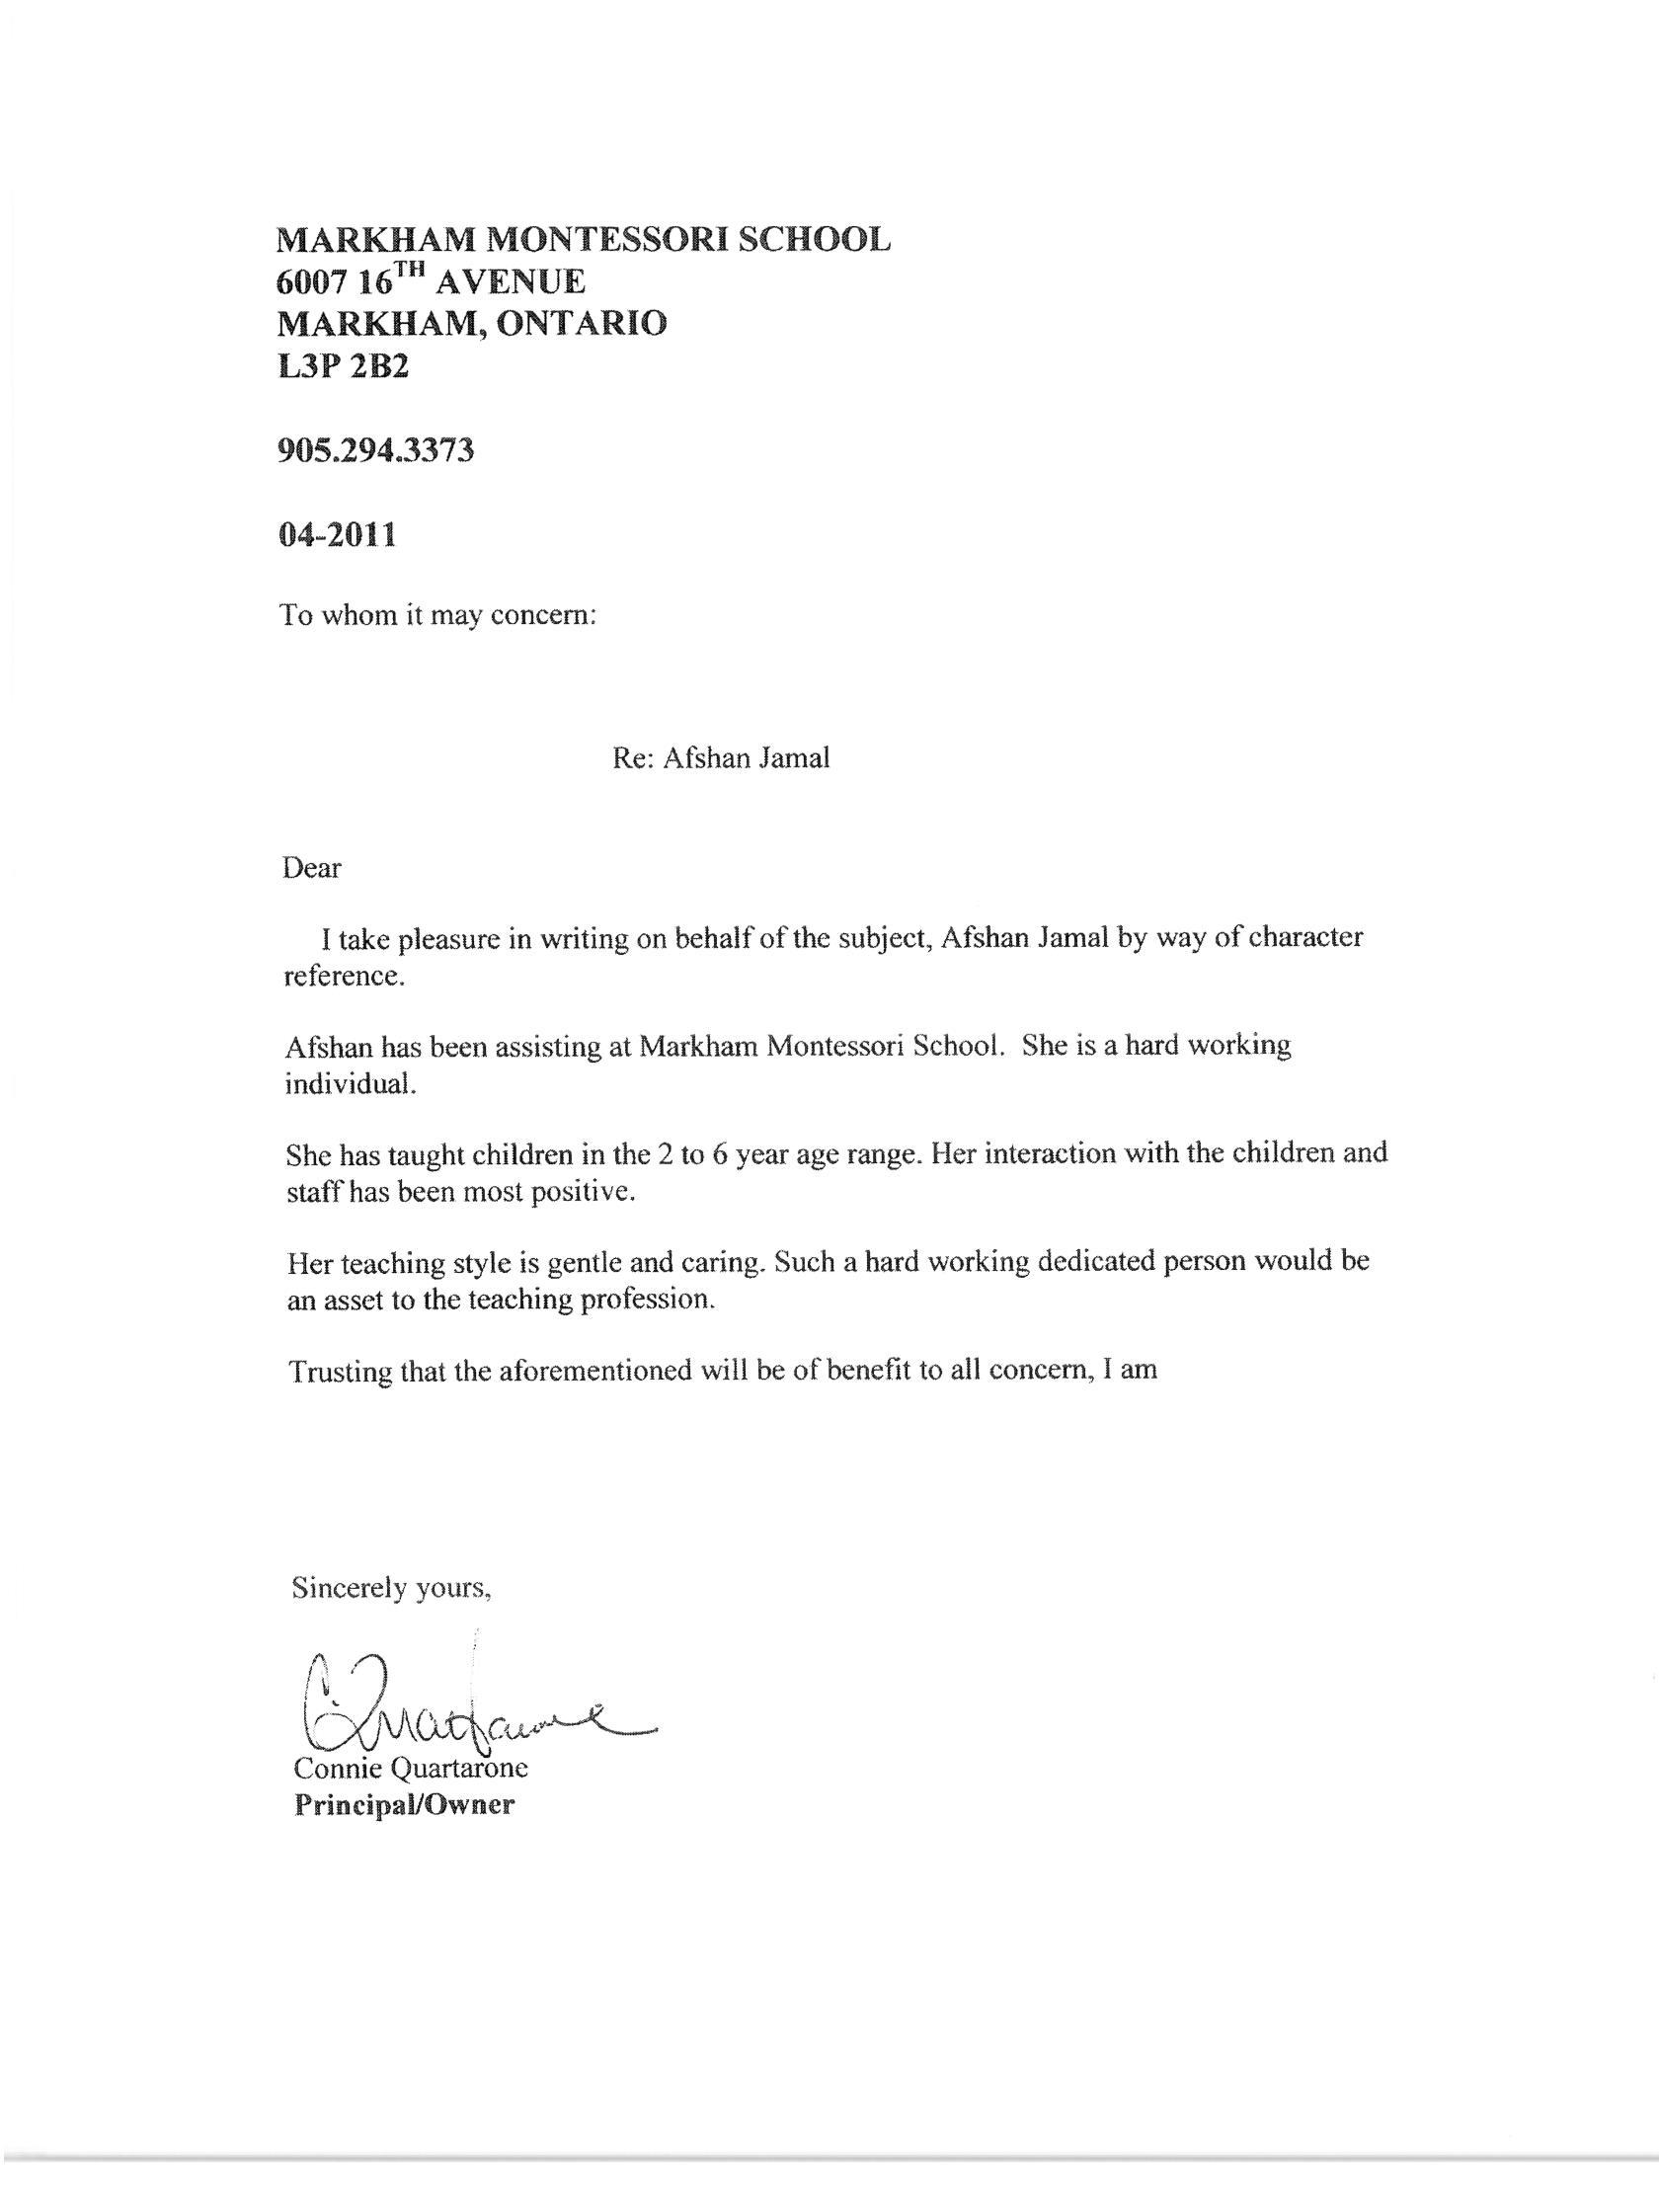 cover letter for montessori teacher resume resume builder cover letter for montessori teacher resume preschool teacher objectives for resume writing services custom professional written